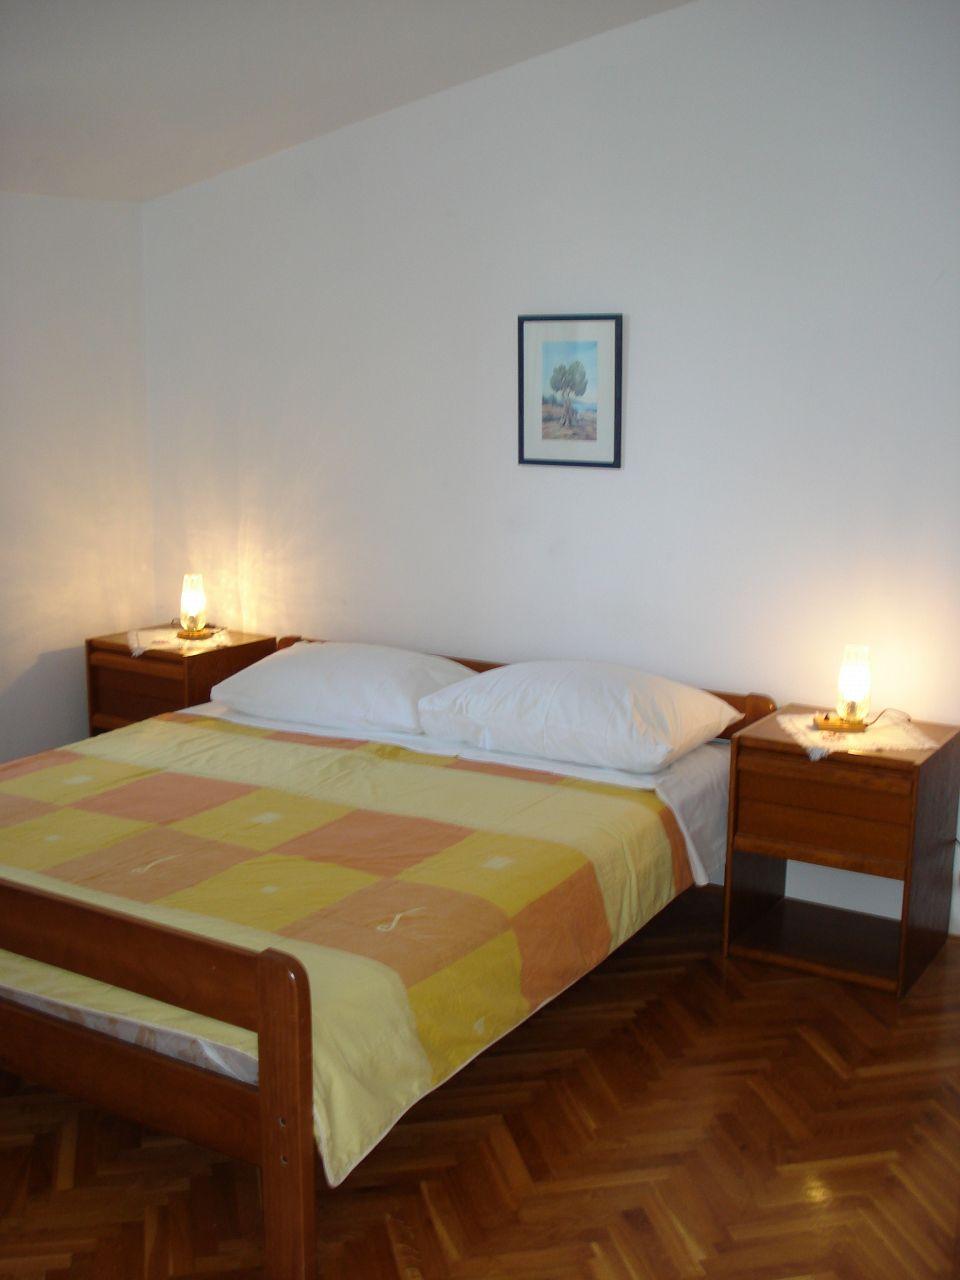 Aпартамент Apartment DK A3 Tribunj, Riviera Sibenik 52091, Tribunj, , Šibensko-kninska